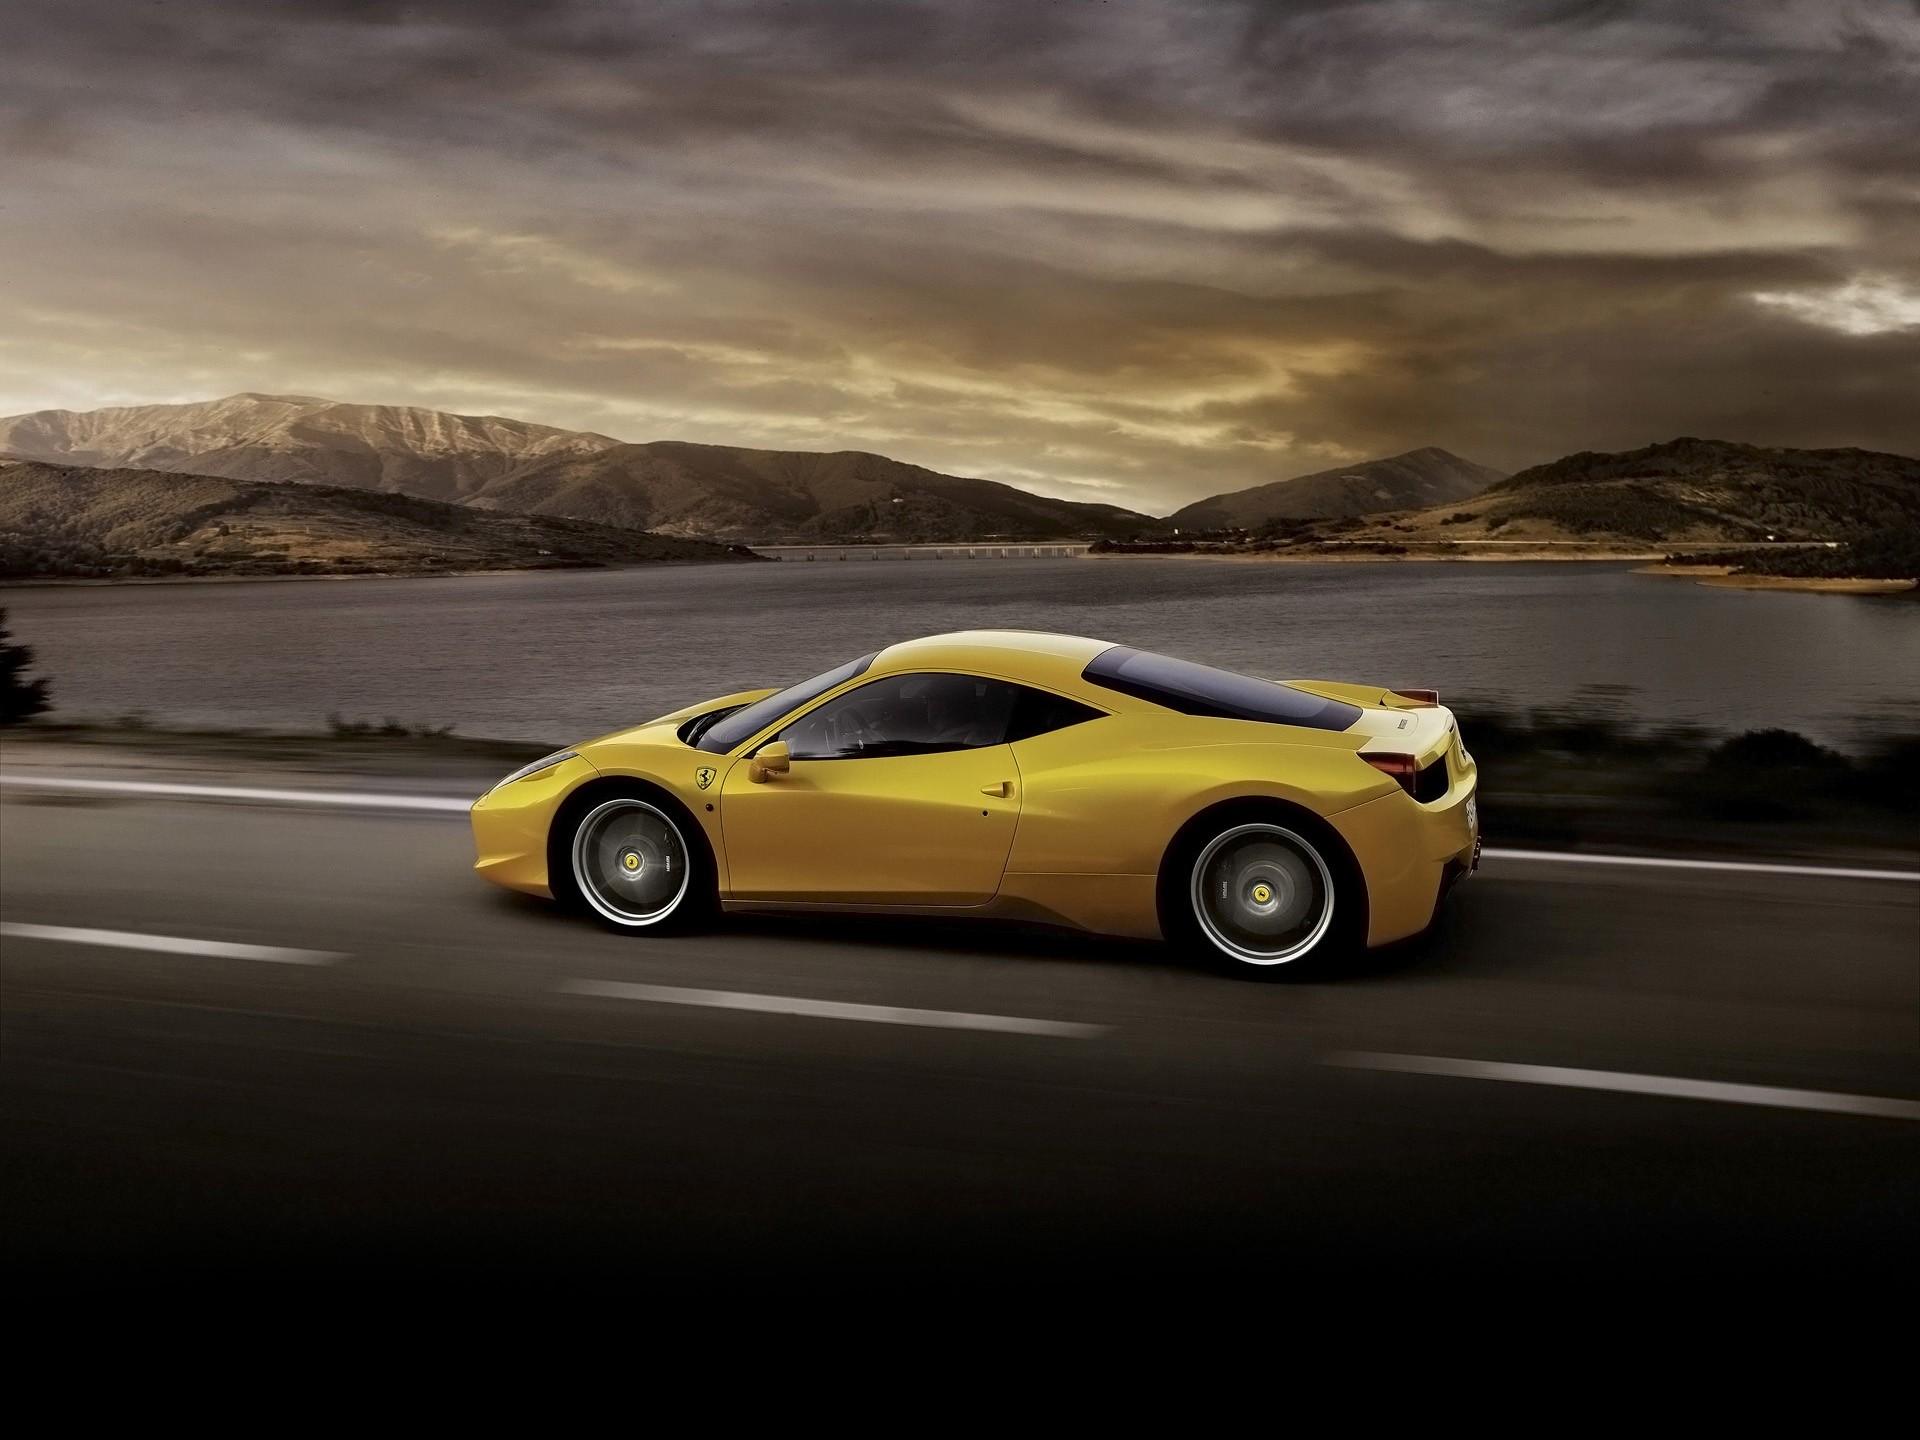 142972 descarga Amarillo fondos de pantalla para tu teléfono gratis, Coches, Ferrari 458 Italia, Automóvil, Vista Lateral, Perfil, Velocidad Amarillo imágenes y protectores de pantalla para tu teléfono